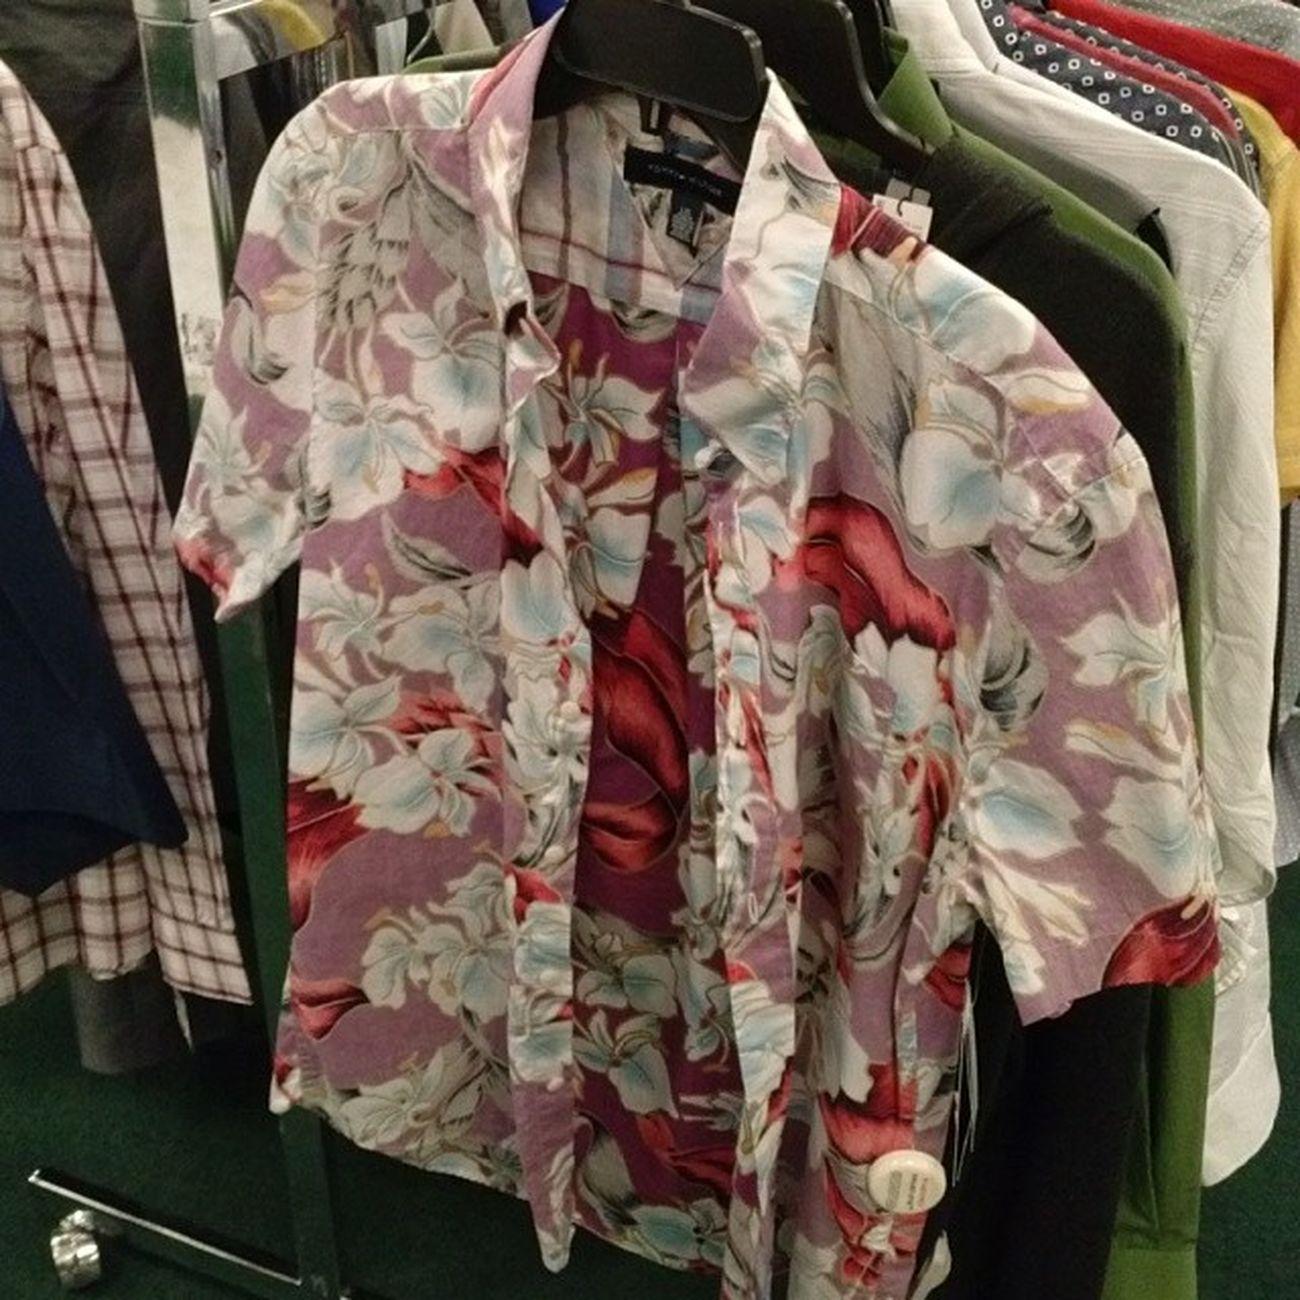 Oh hell yeah!!! Nice shirt Wyattfamiy Followthebuzzards style